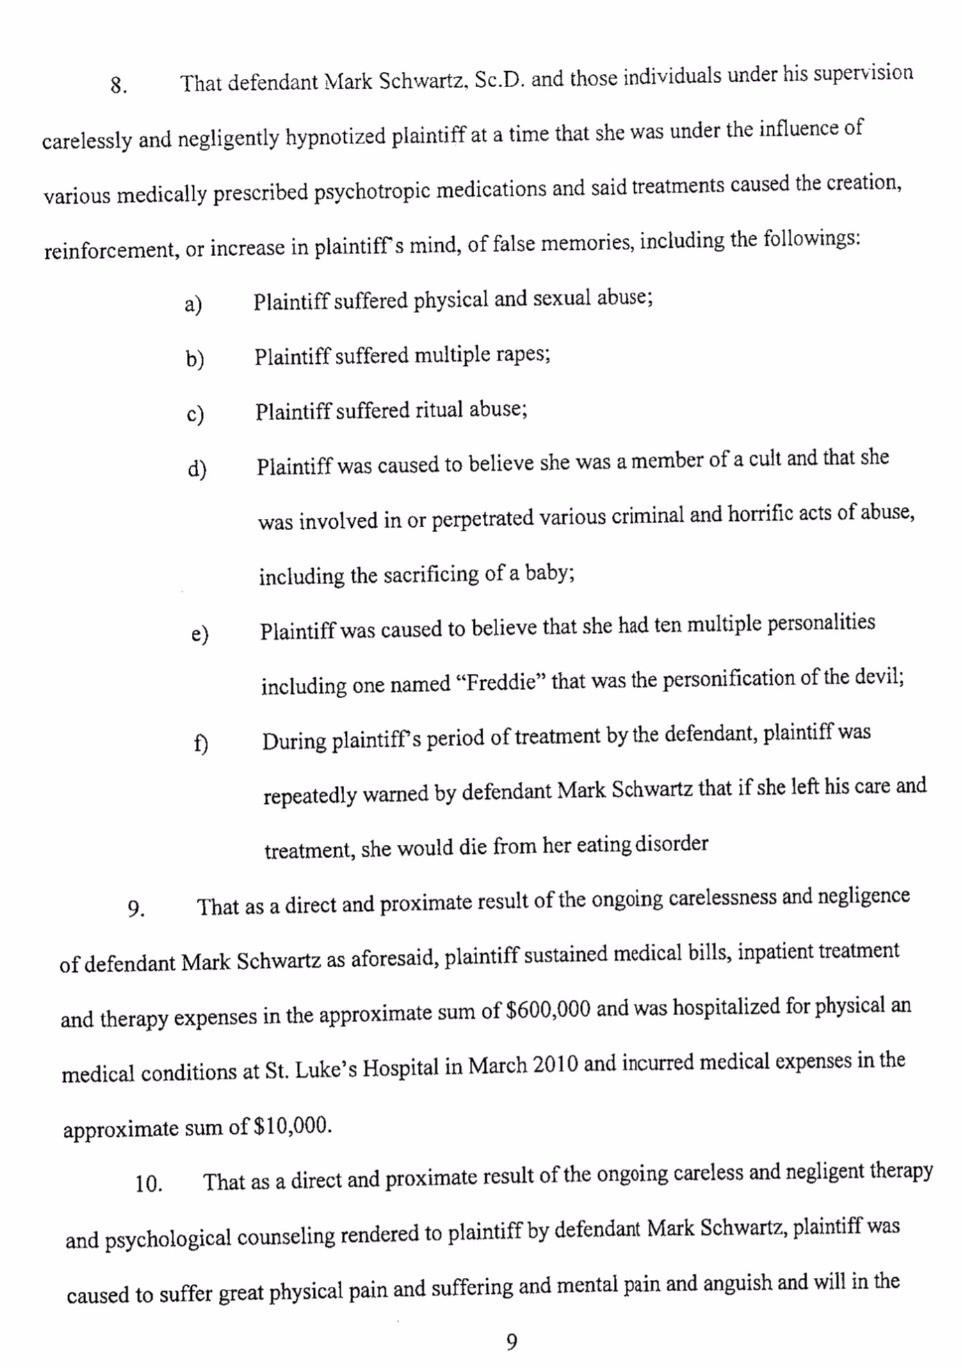 Castlewood Lawsuit/Mark Schwartz #2 - Leslie Thompson - page 9